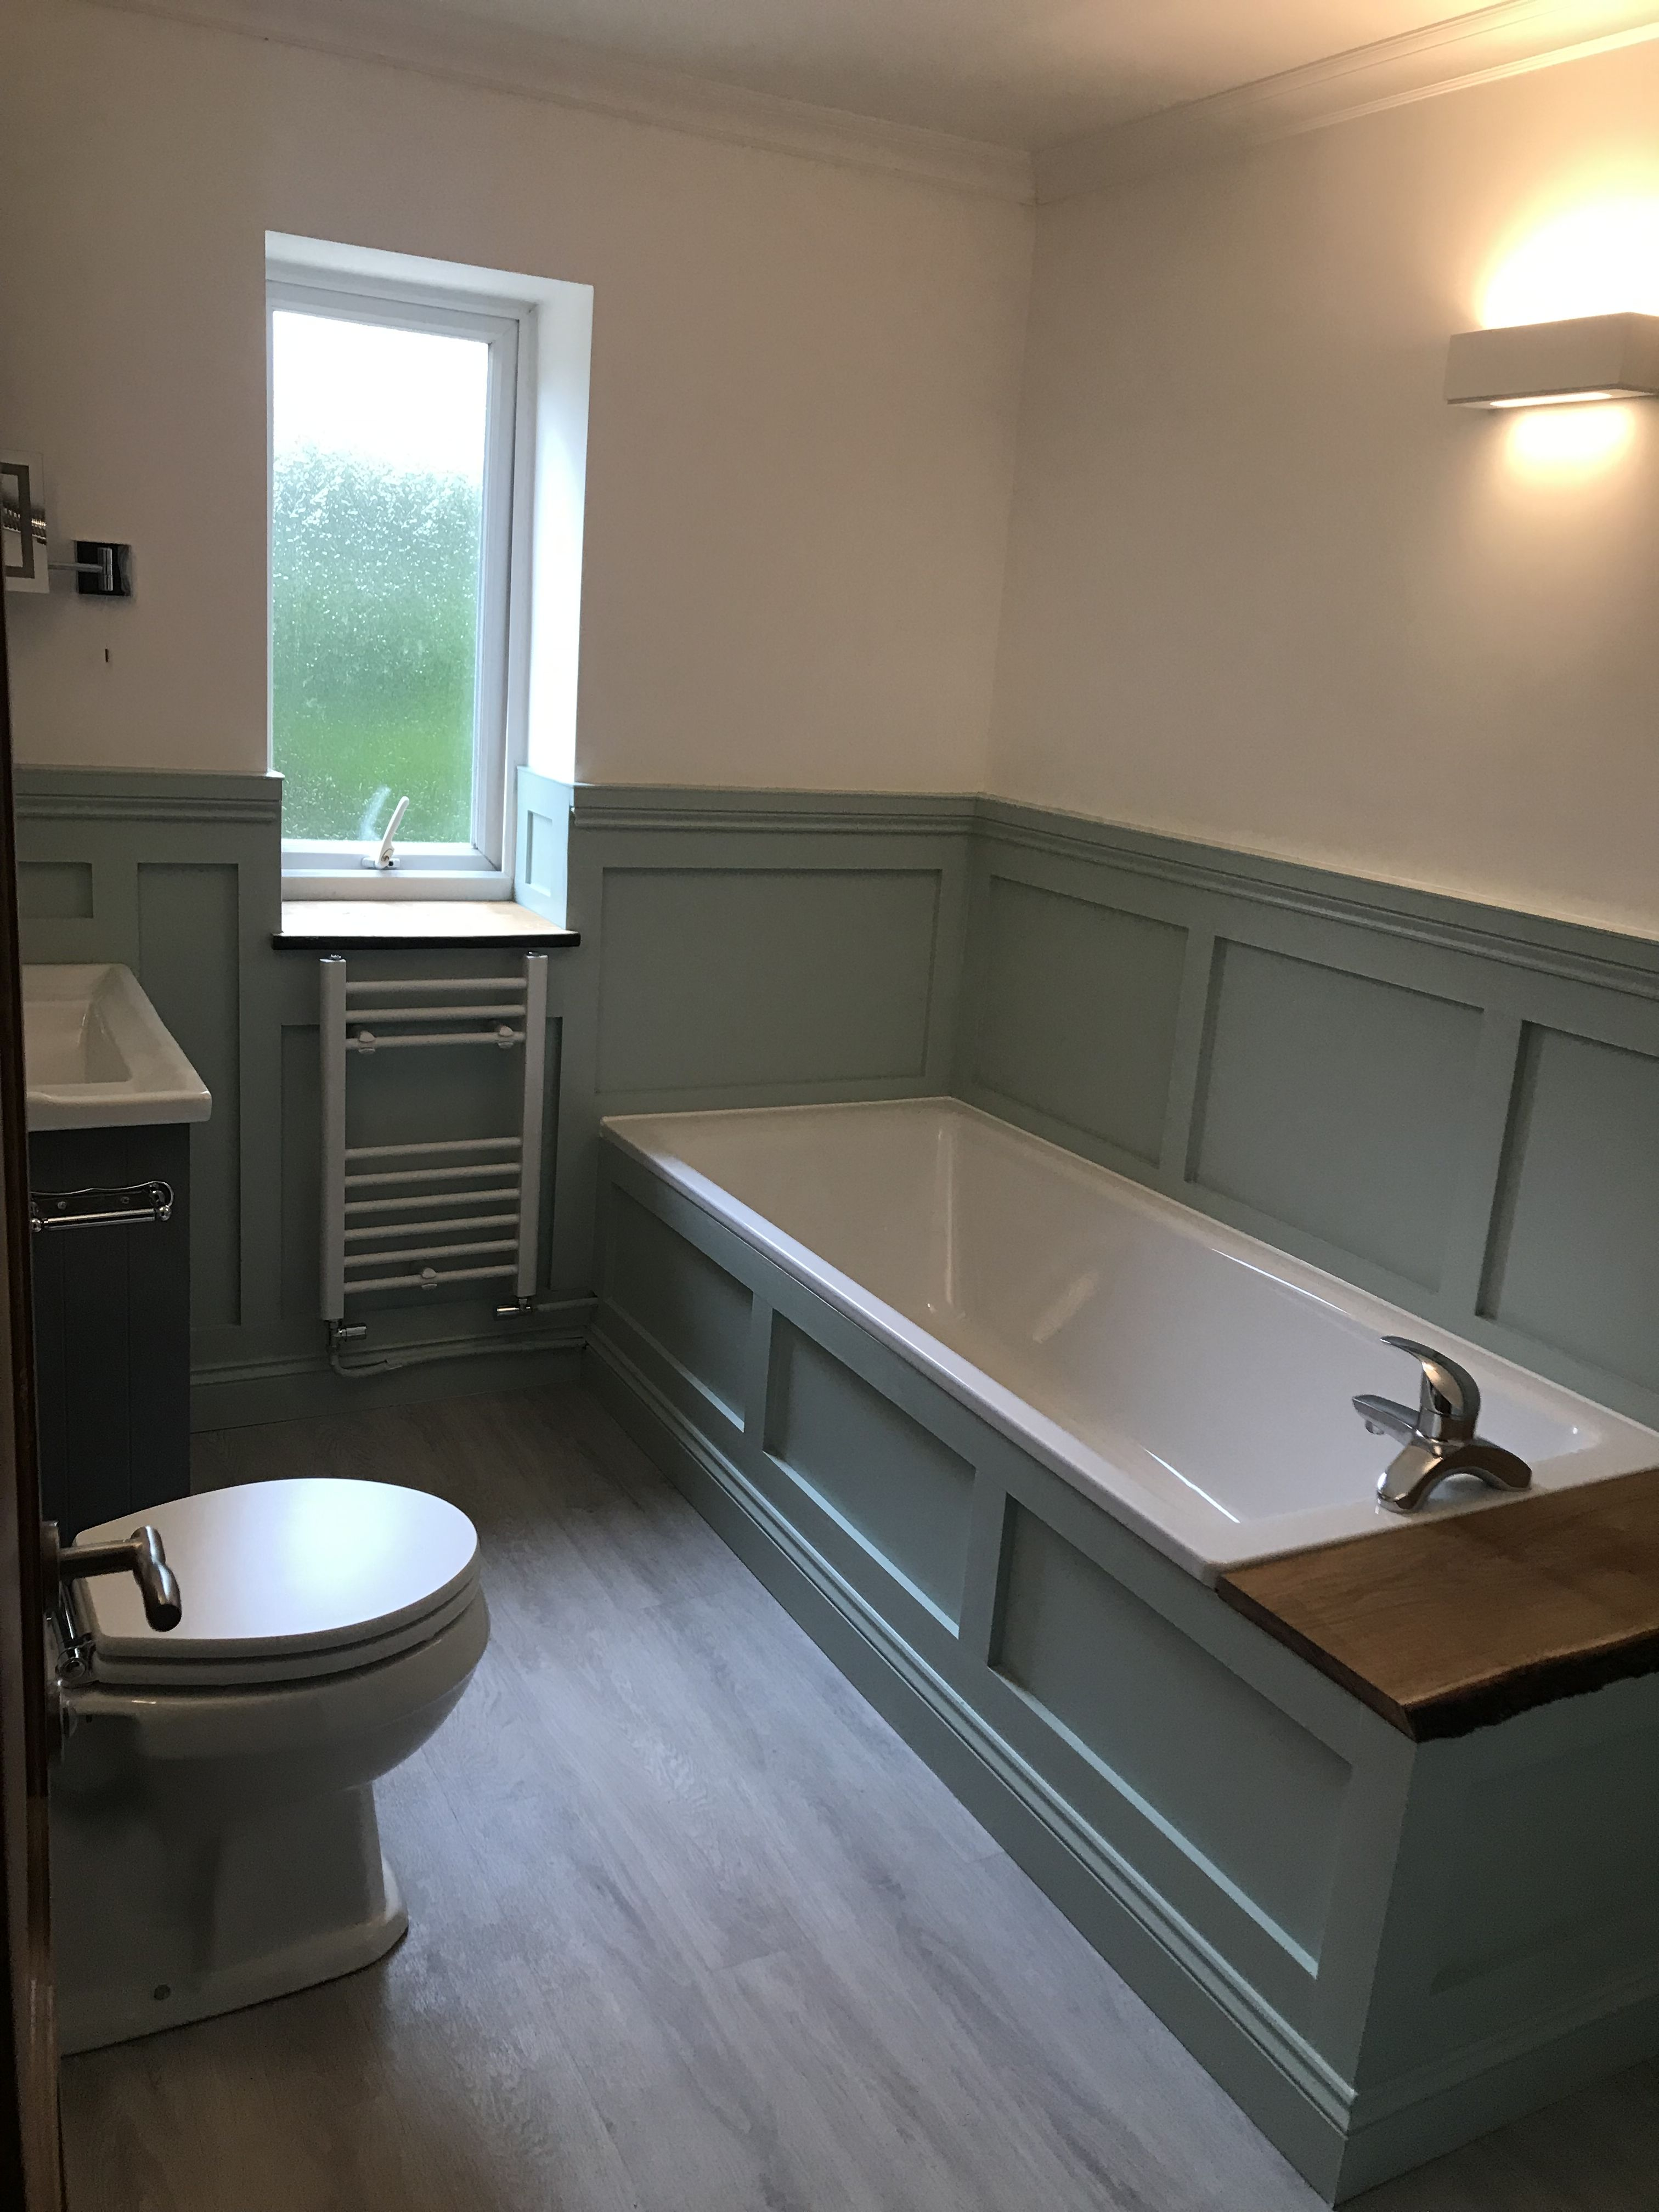 jerry's panelled bathroom  green tile bathroom bathroom